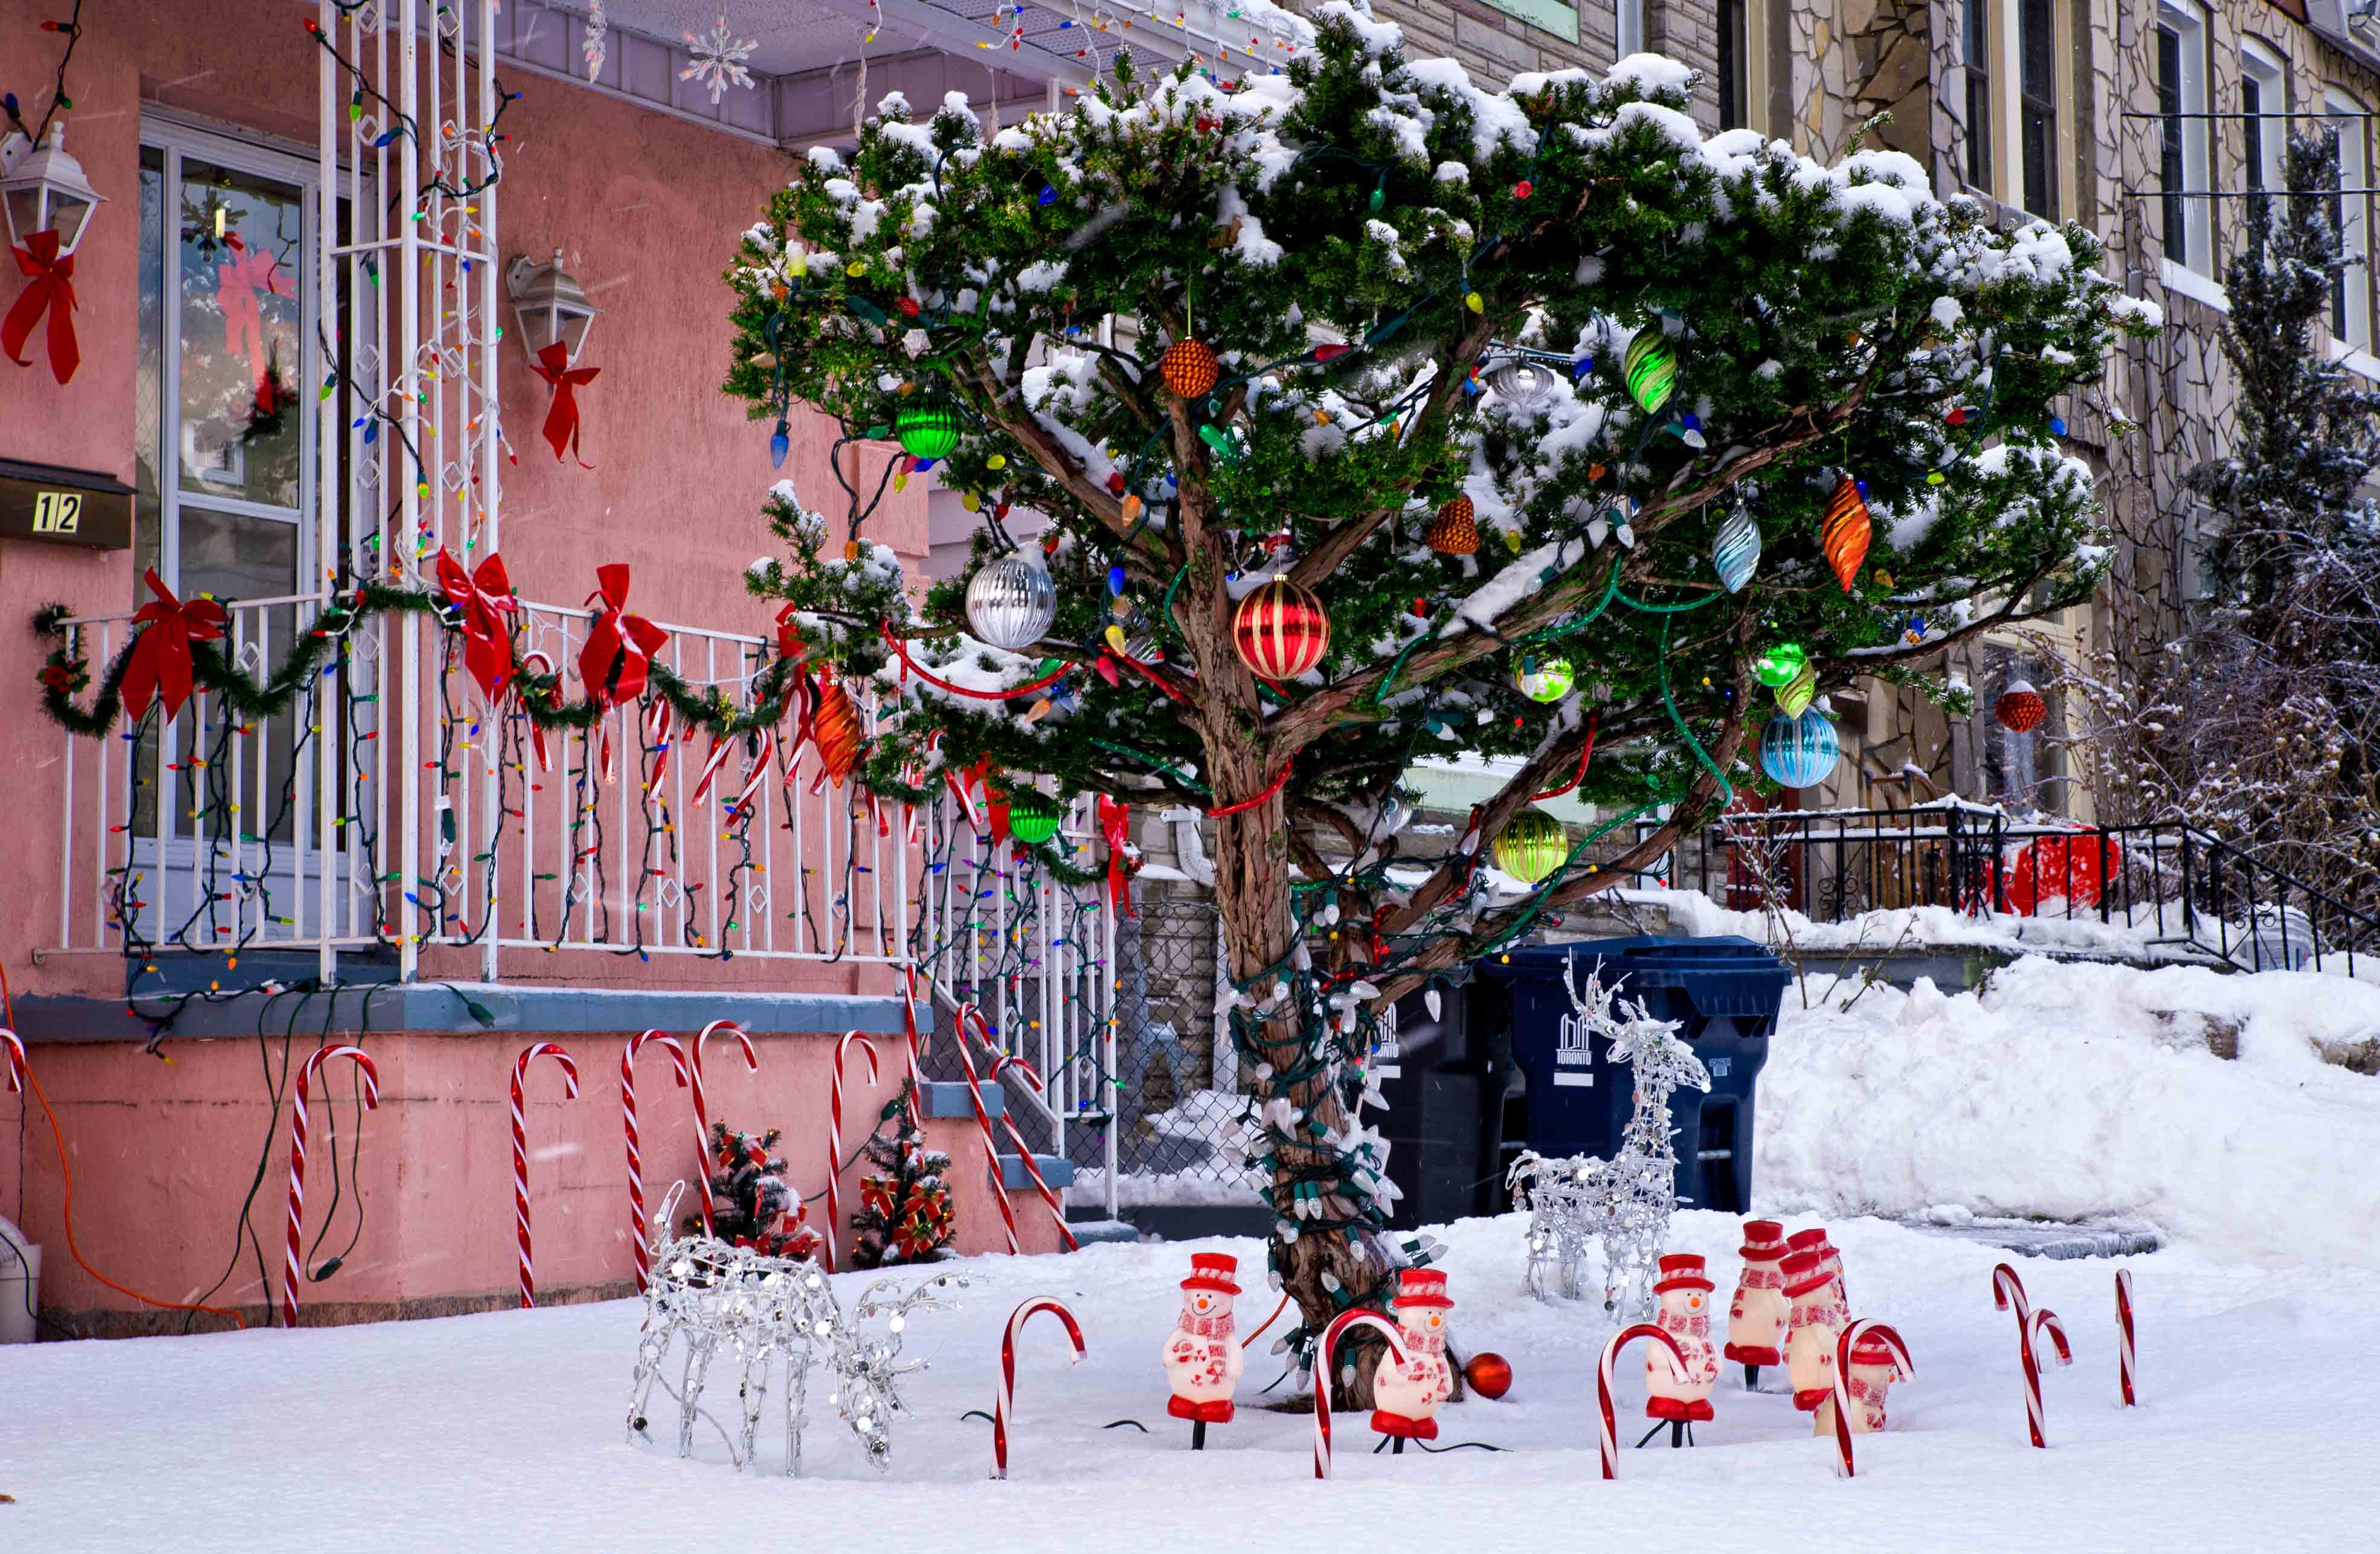 Christmas tree and Snowmen